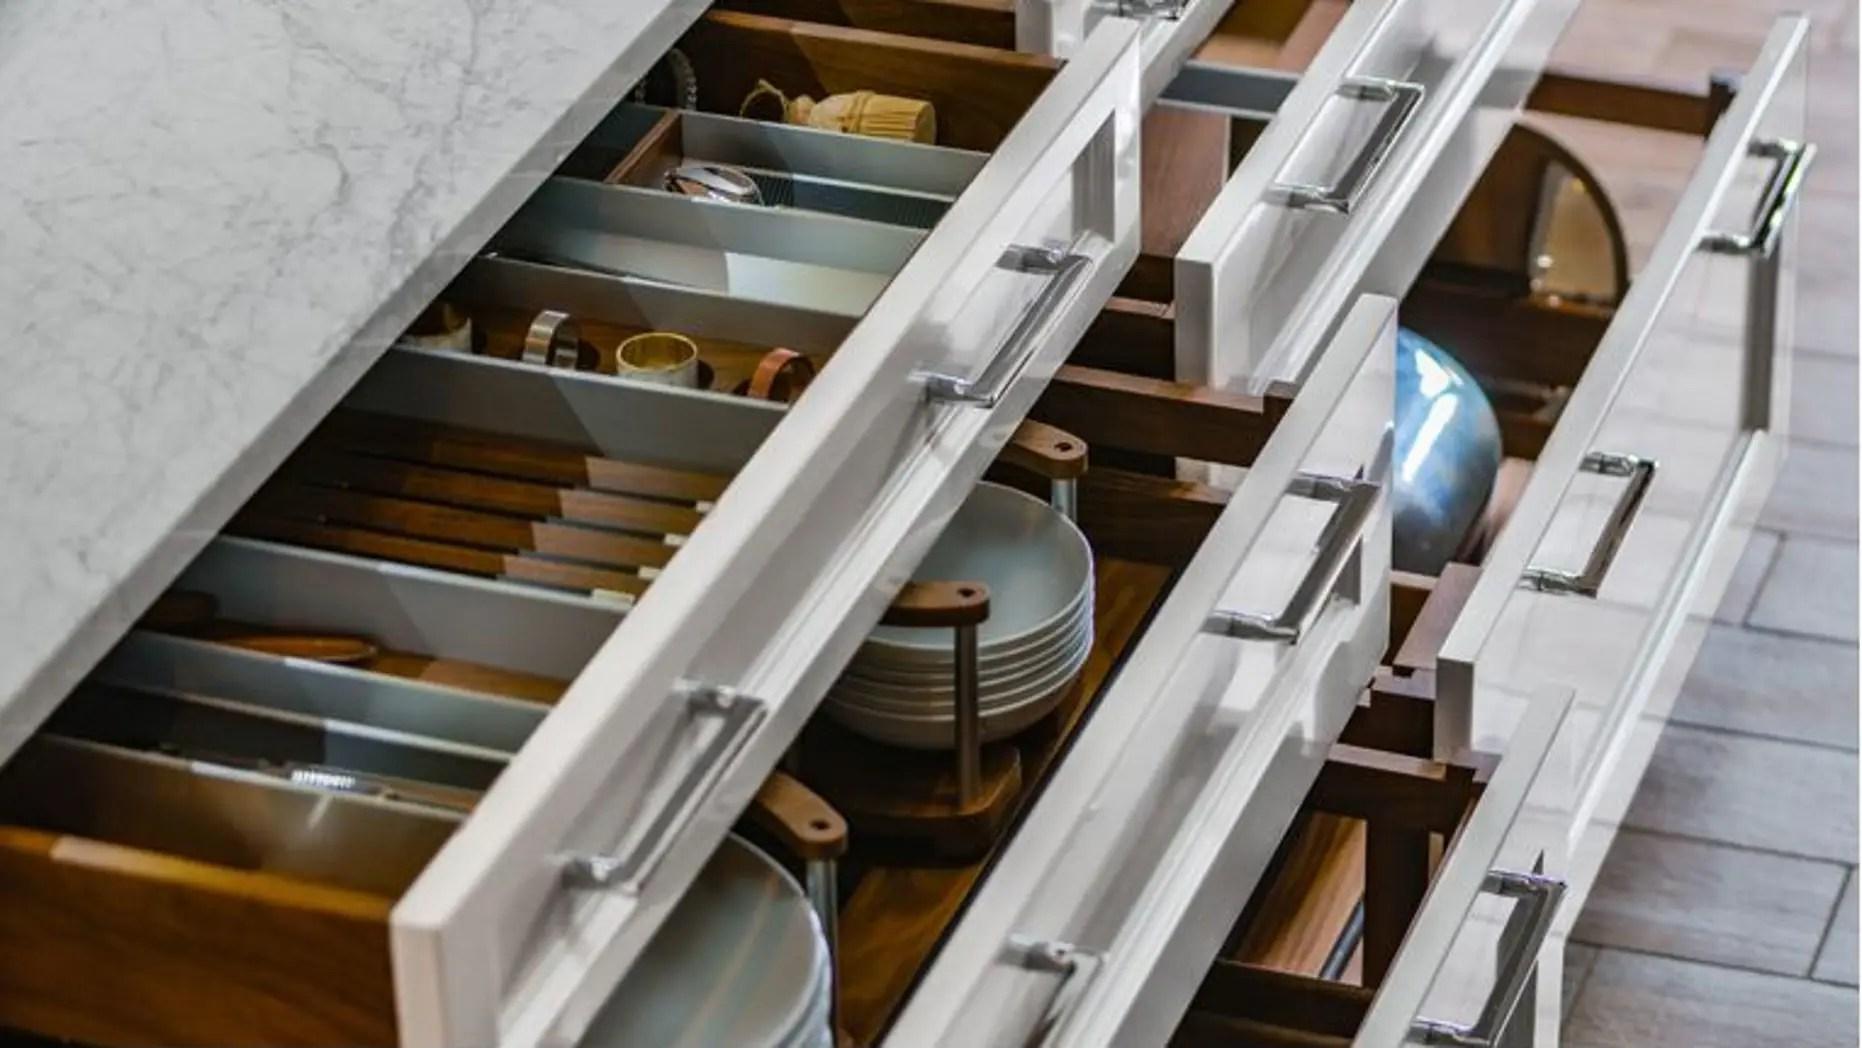 kitchen tools store desks storage 101 how to and flatware fox news